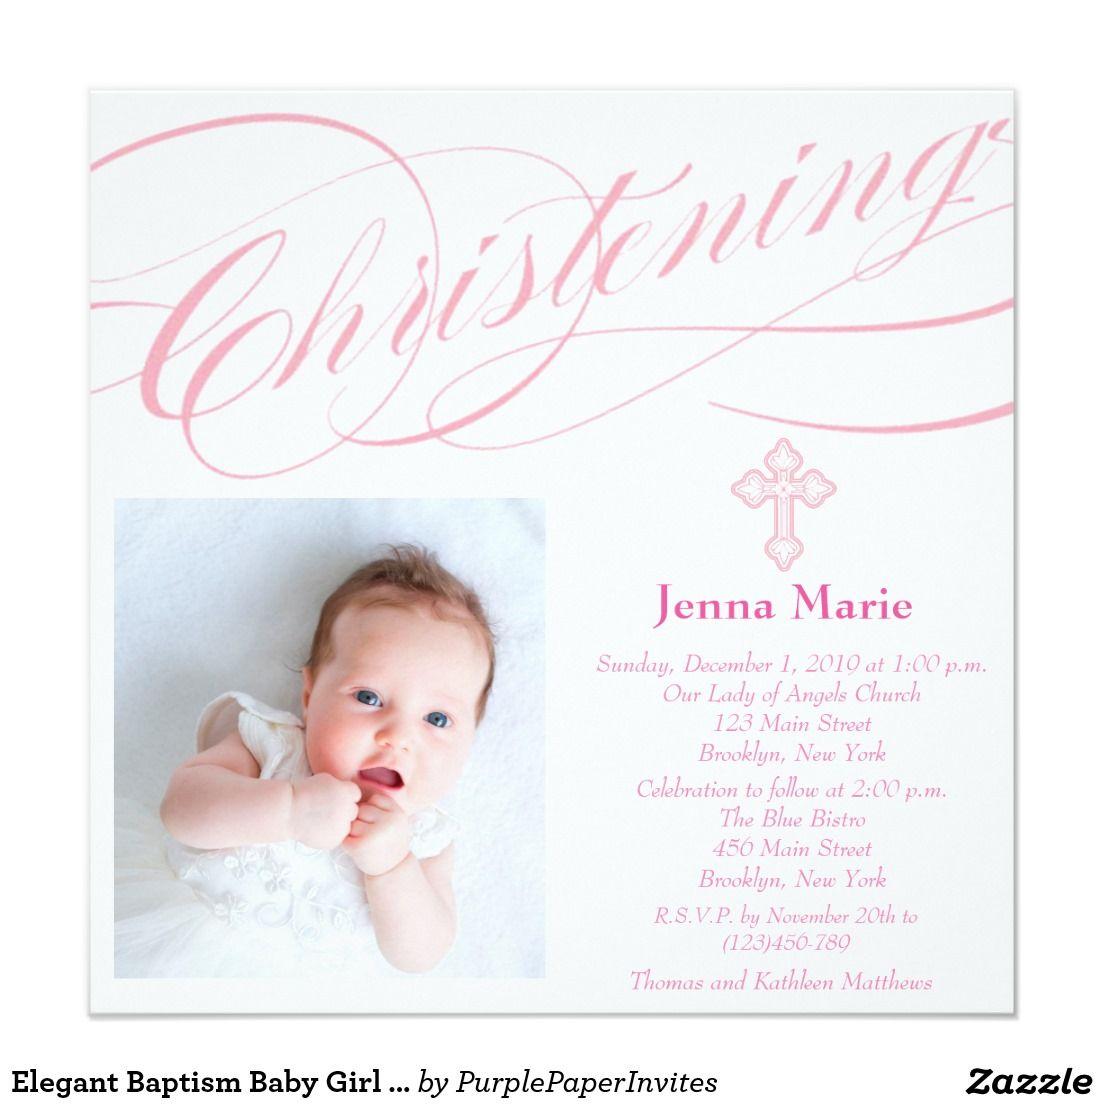 Elegant Baptism Baby Girl Photo Invitation Zazzle Com